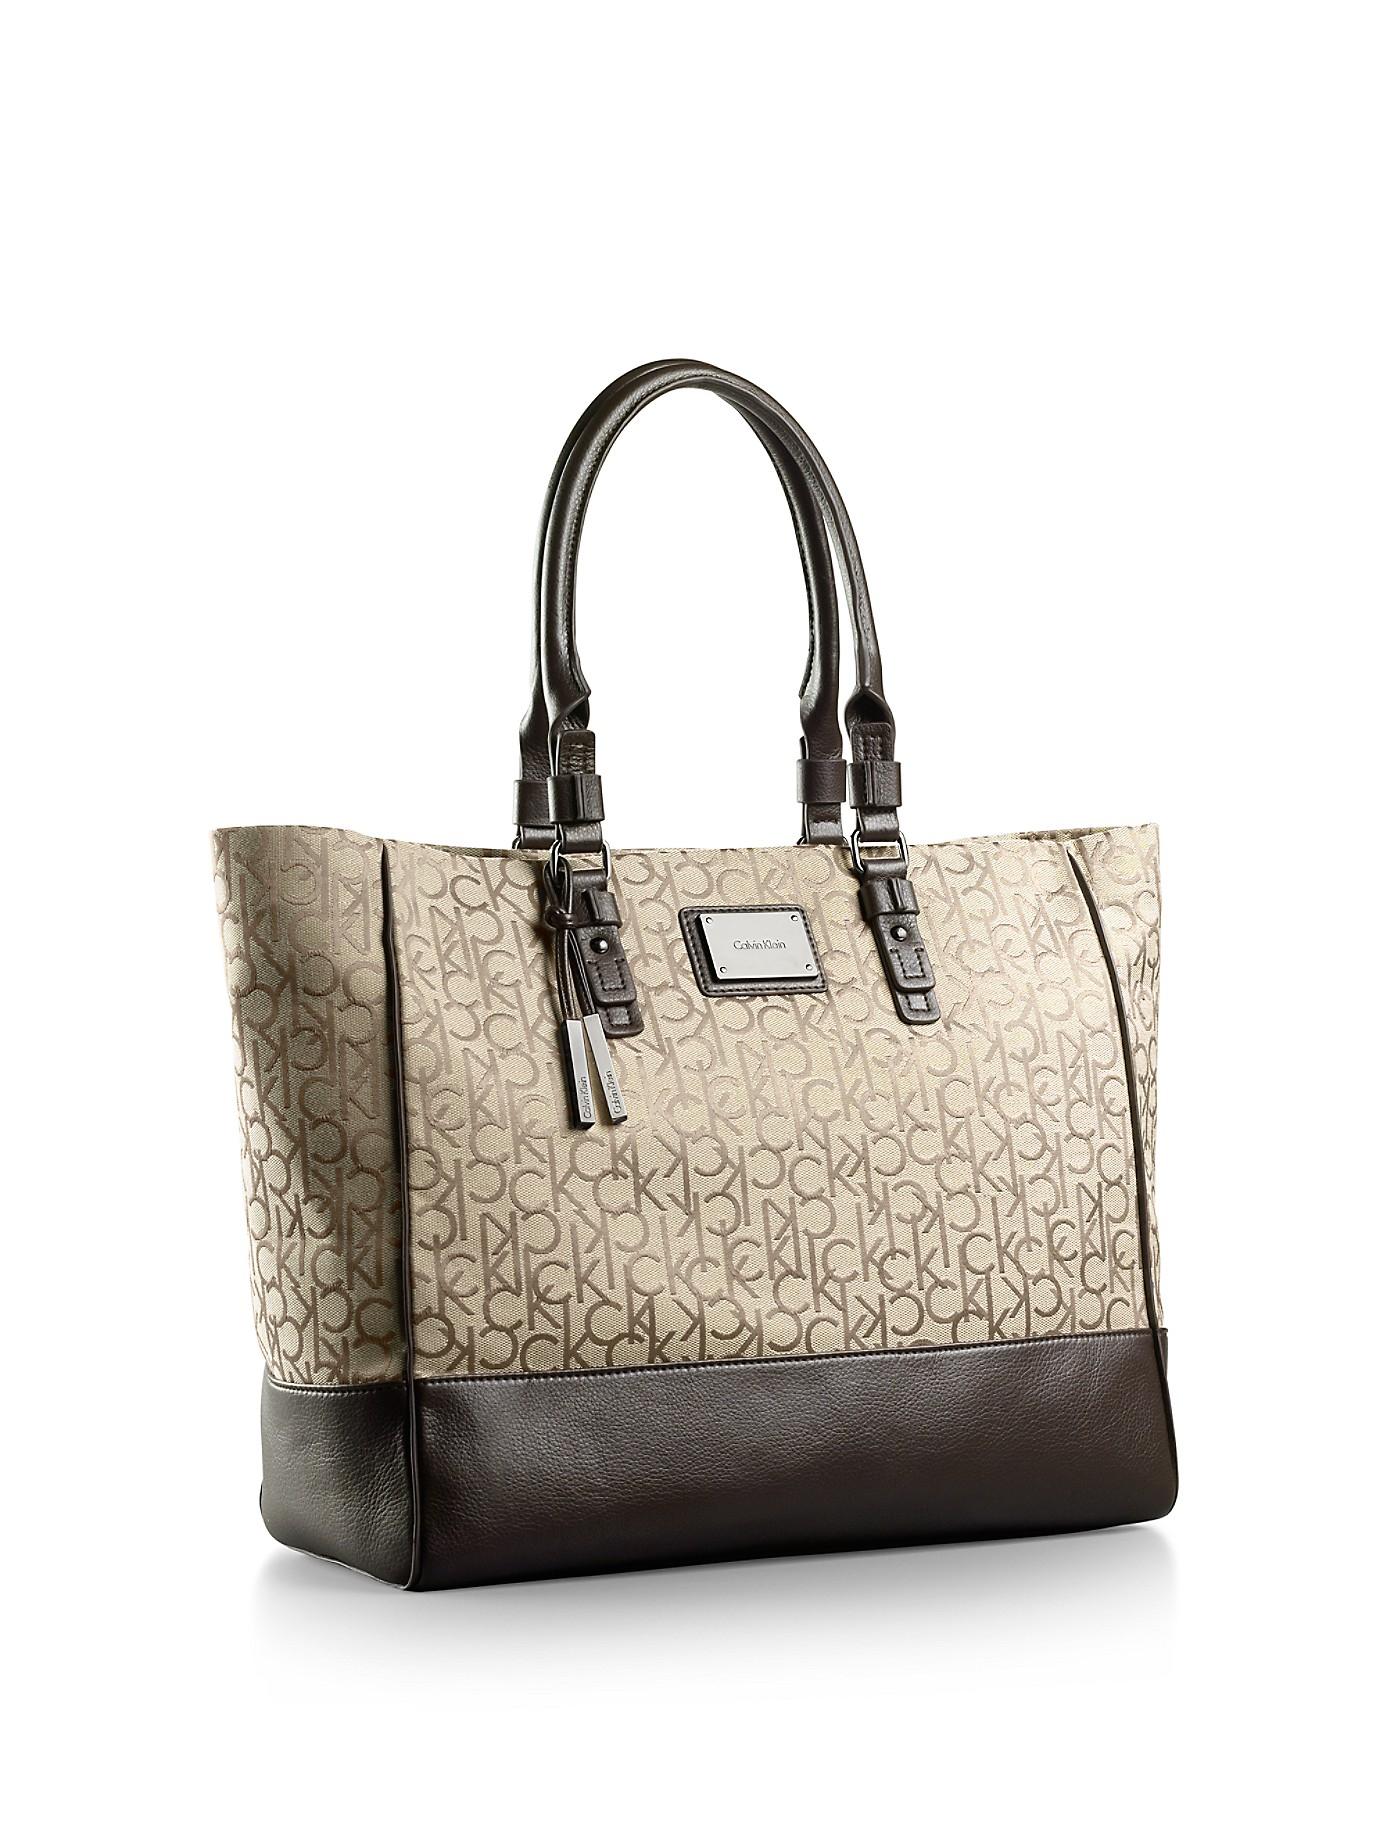 Calvin klein White Label Logo Jacquard Fabric Shopper Tote Bag in ...